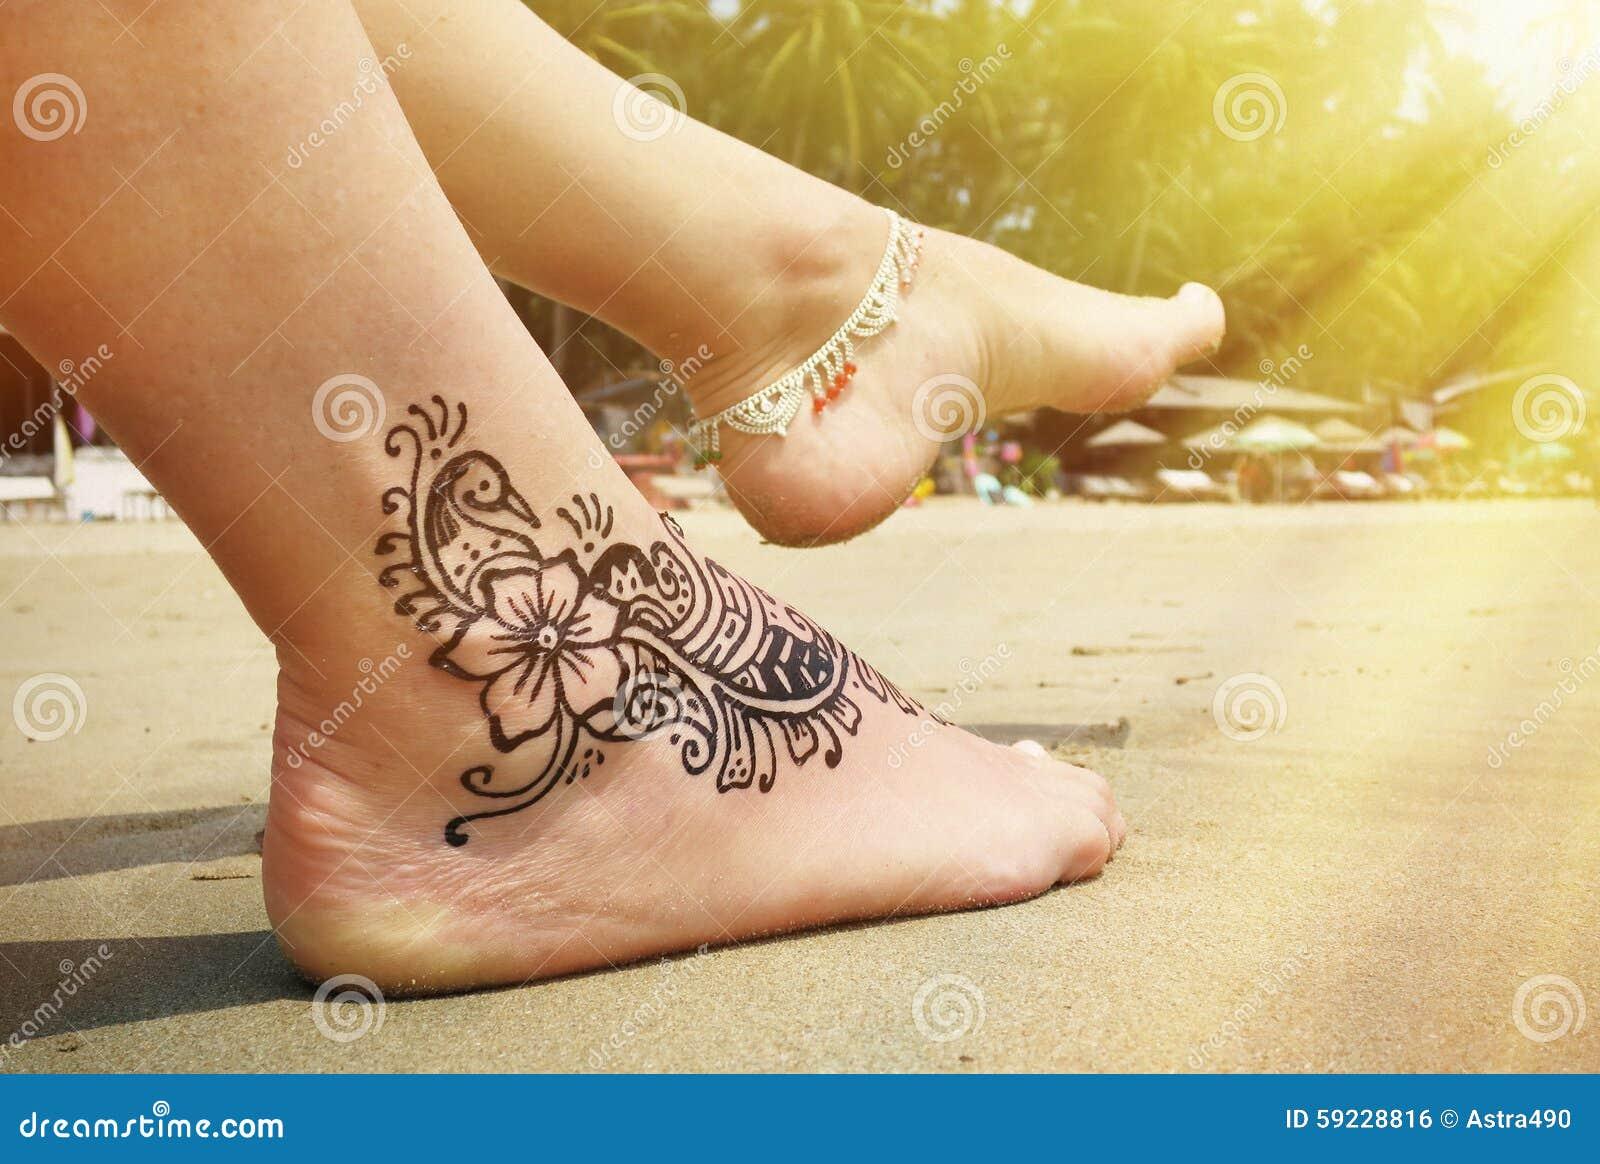 Henna Tattoo On The Foot Stock Photo Image Of Meditation 59228816